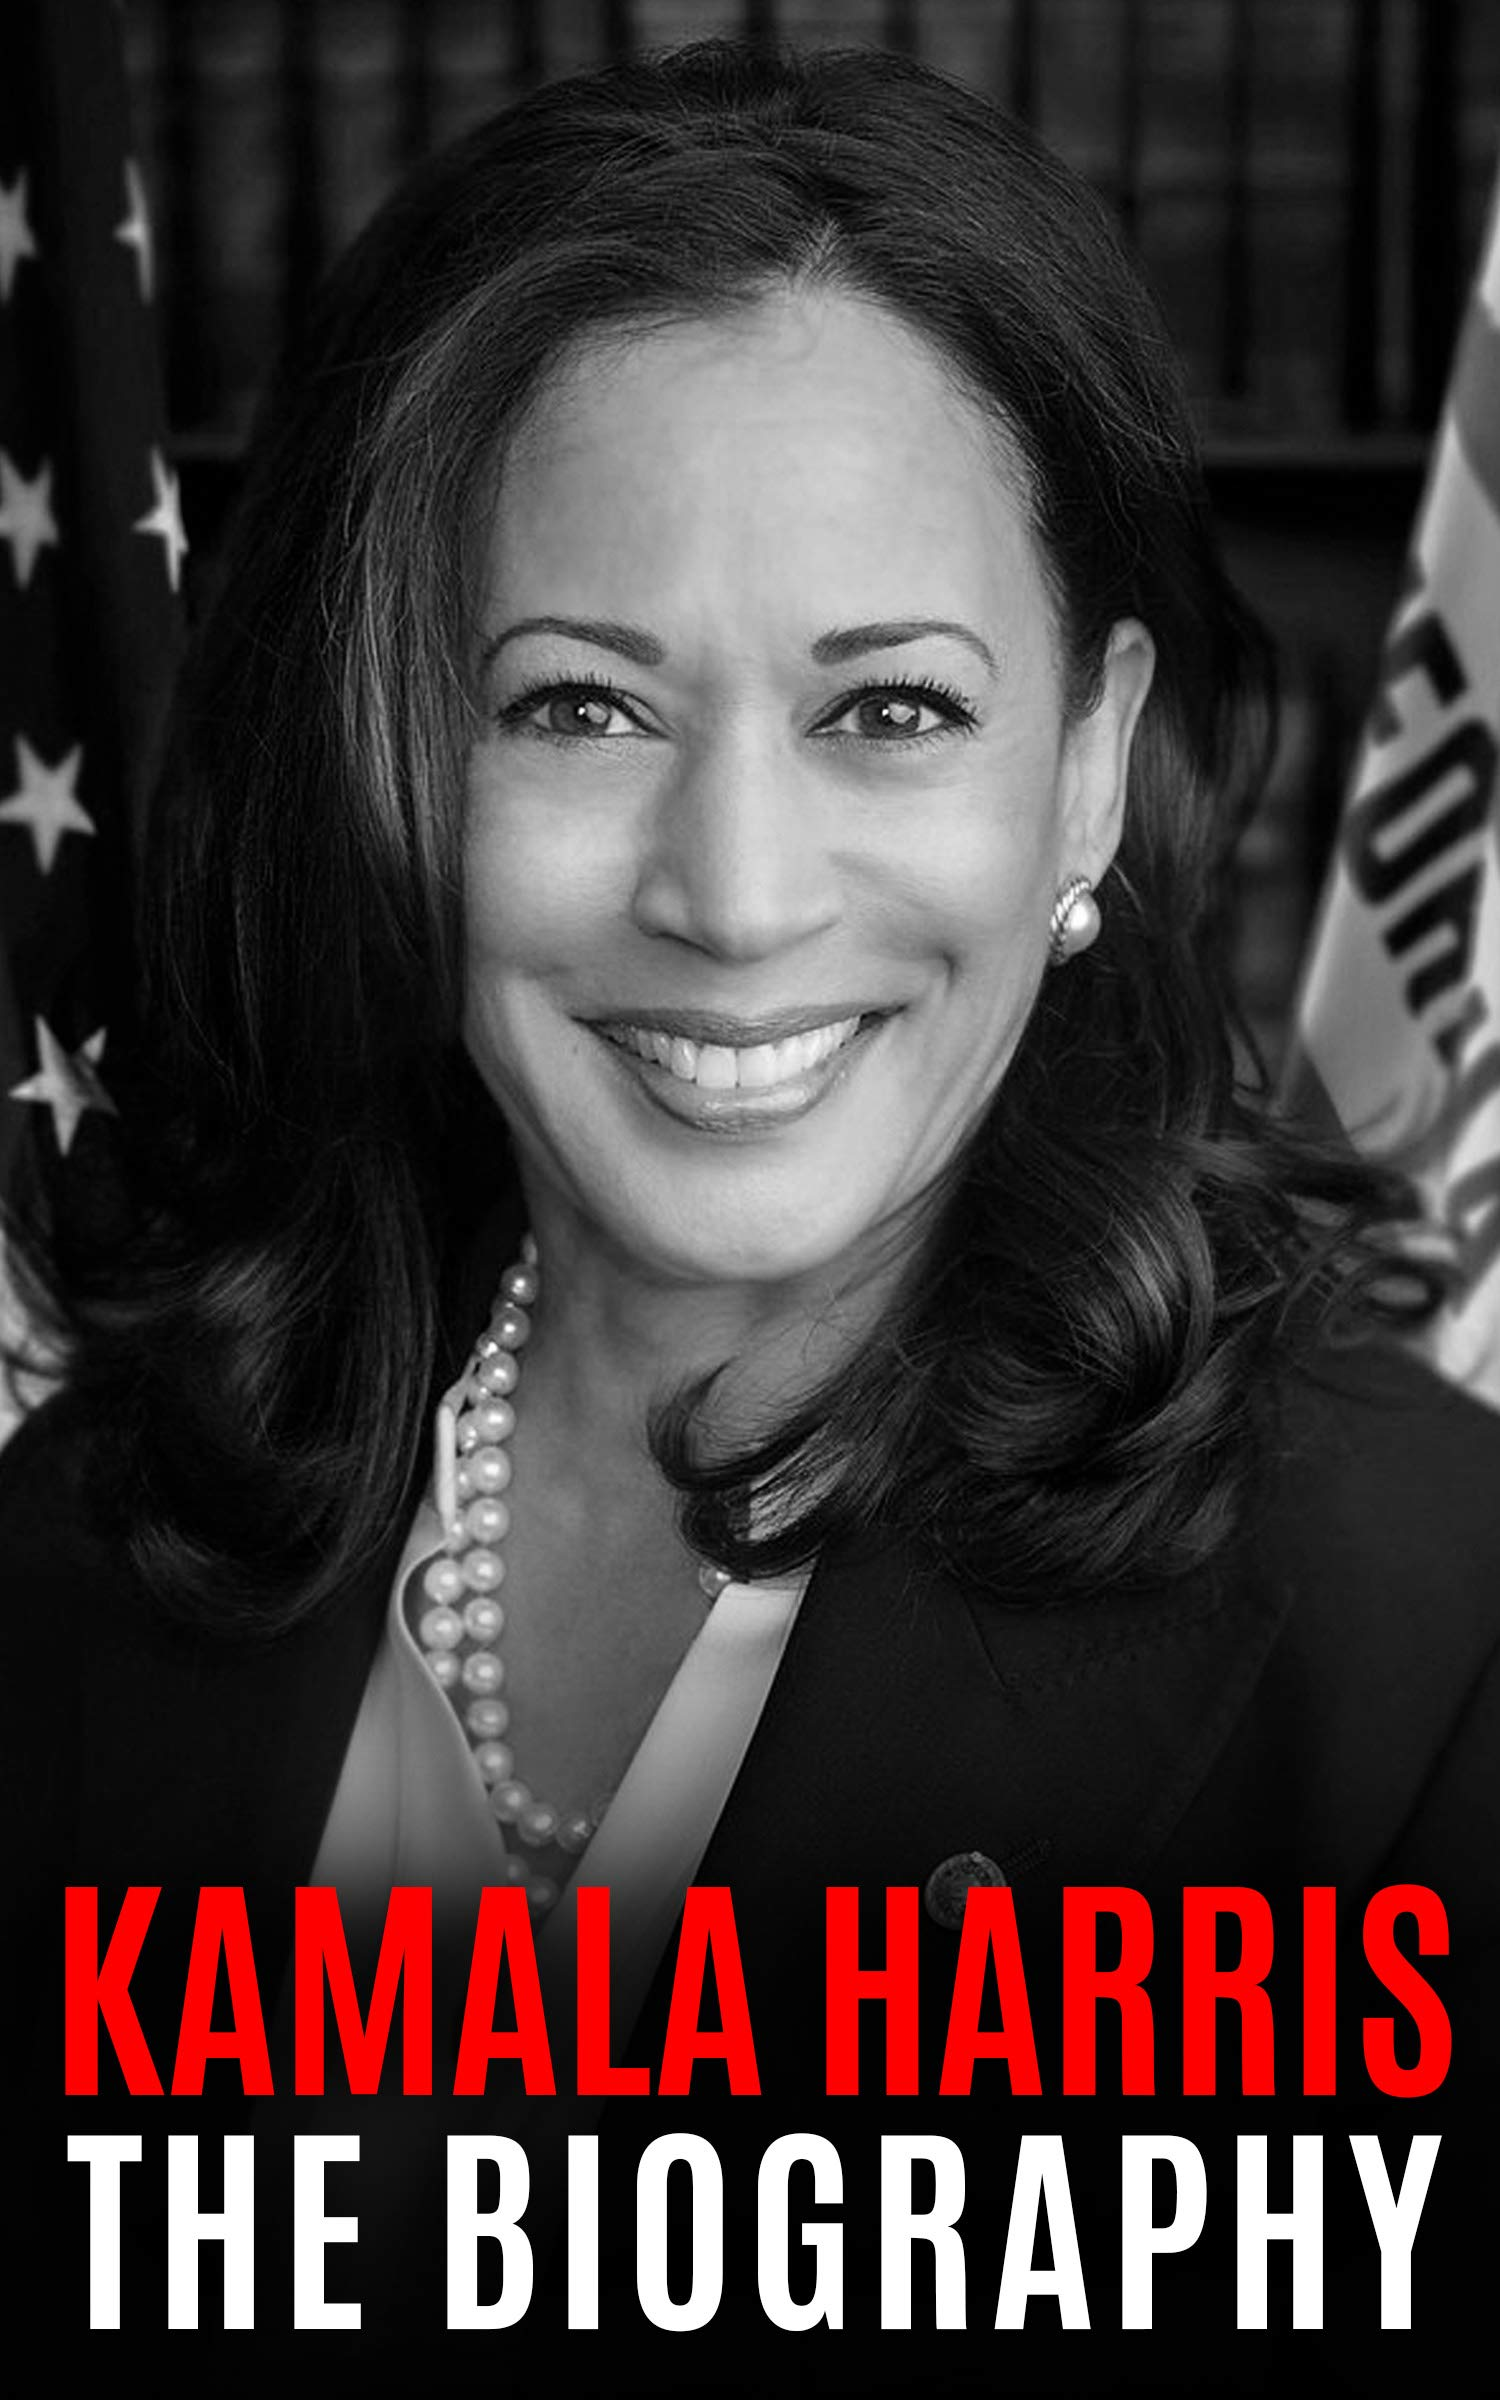 Kamala Harris: The Biography